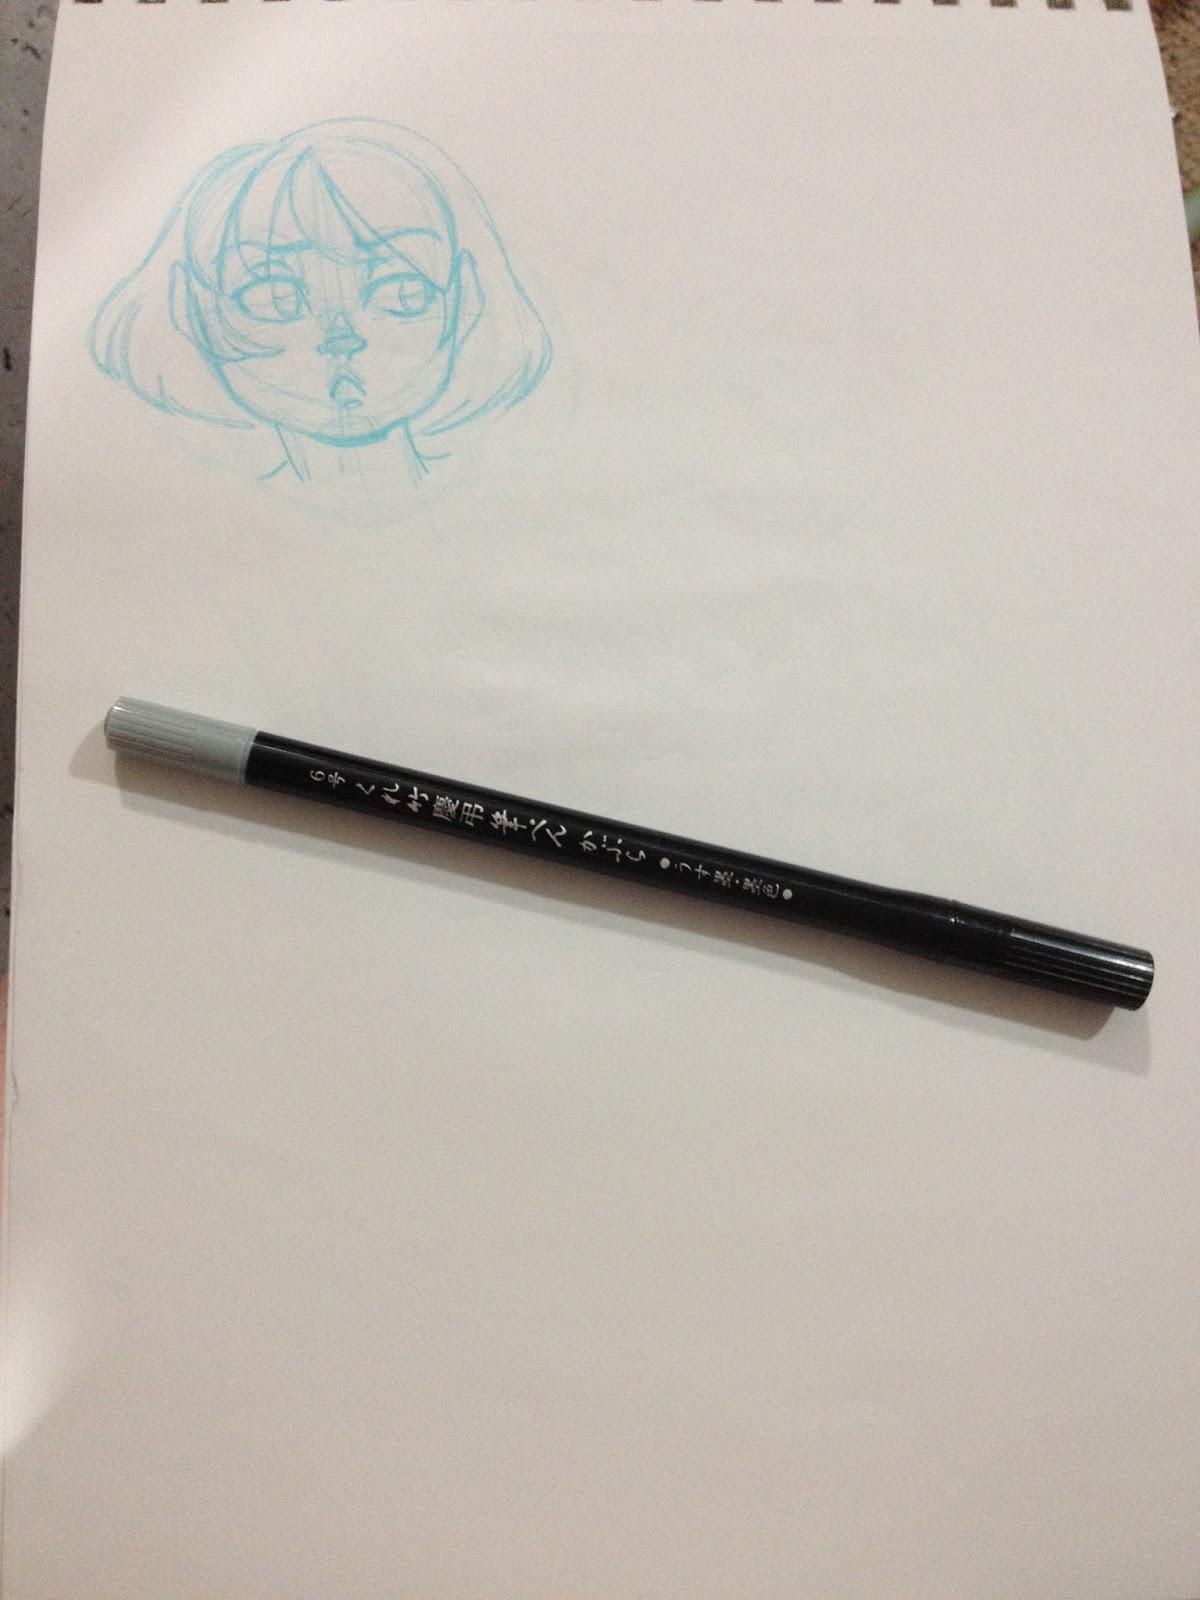 kuretake brush pen instructions